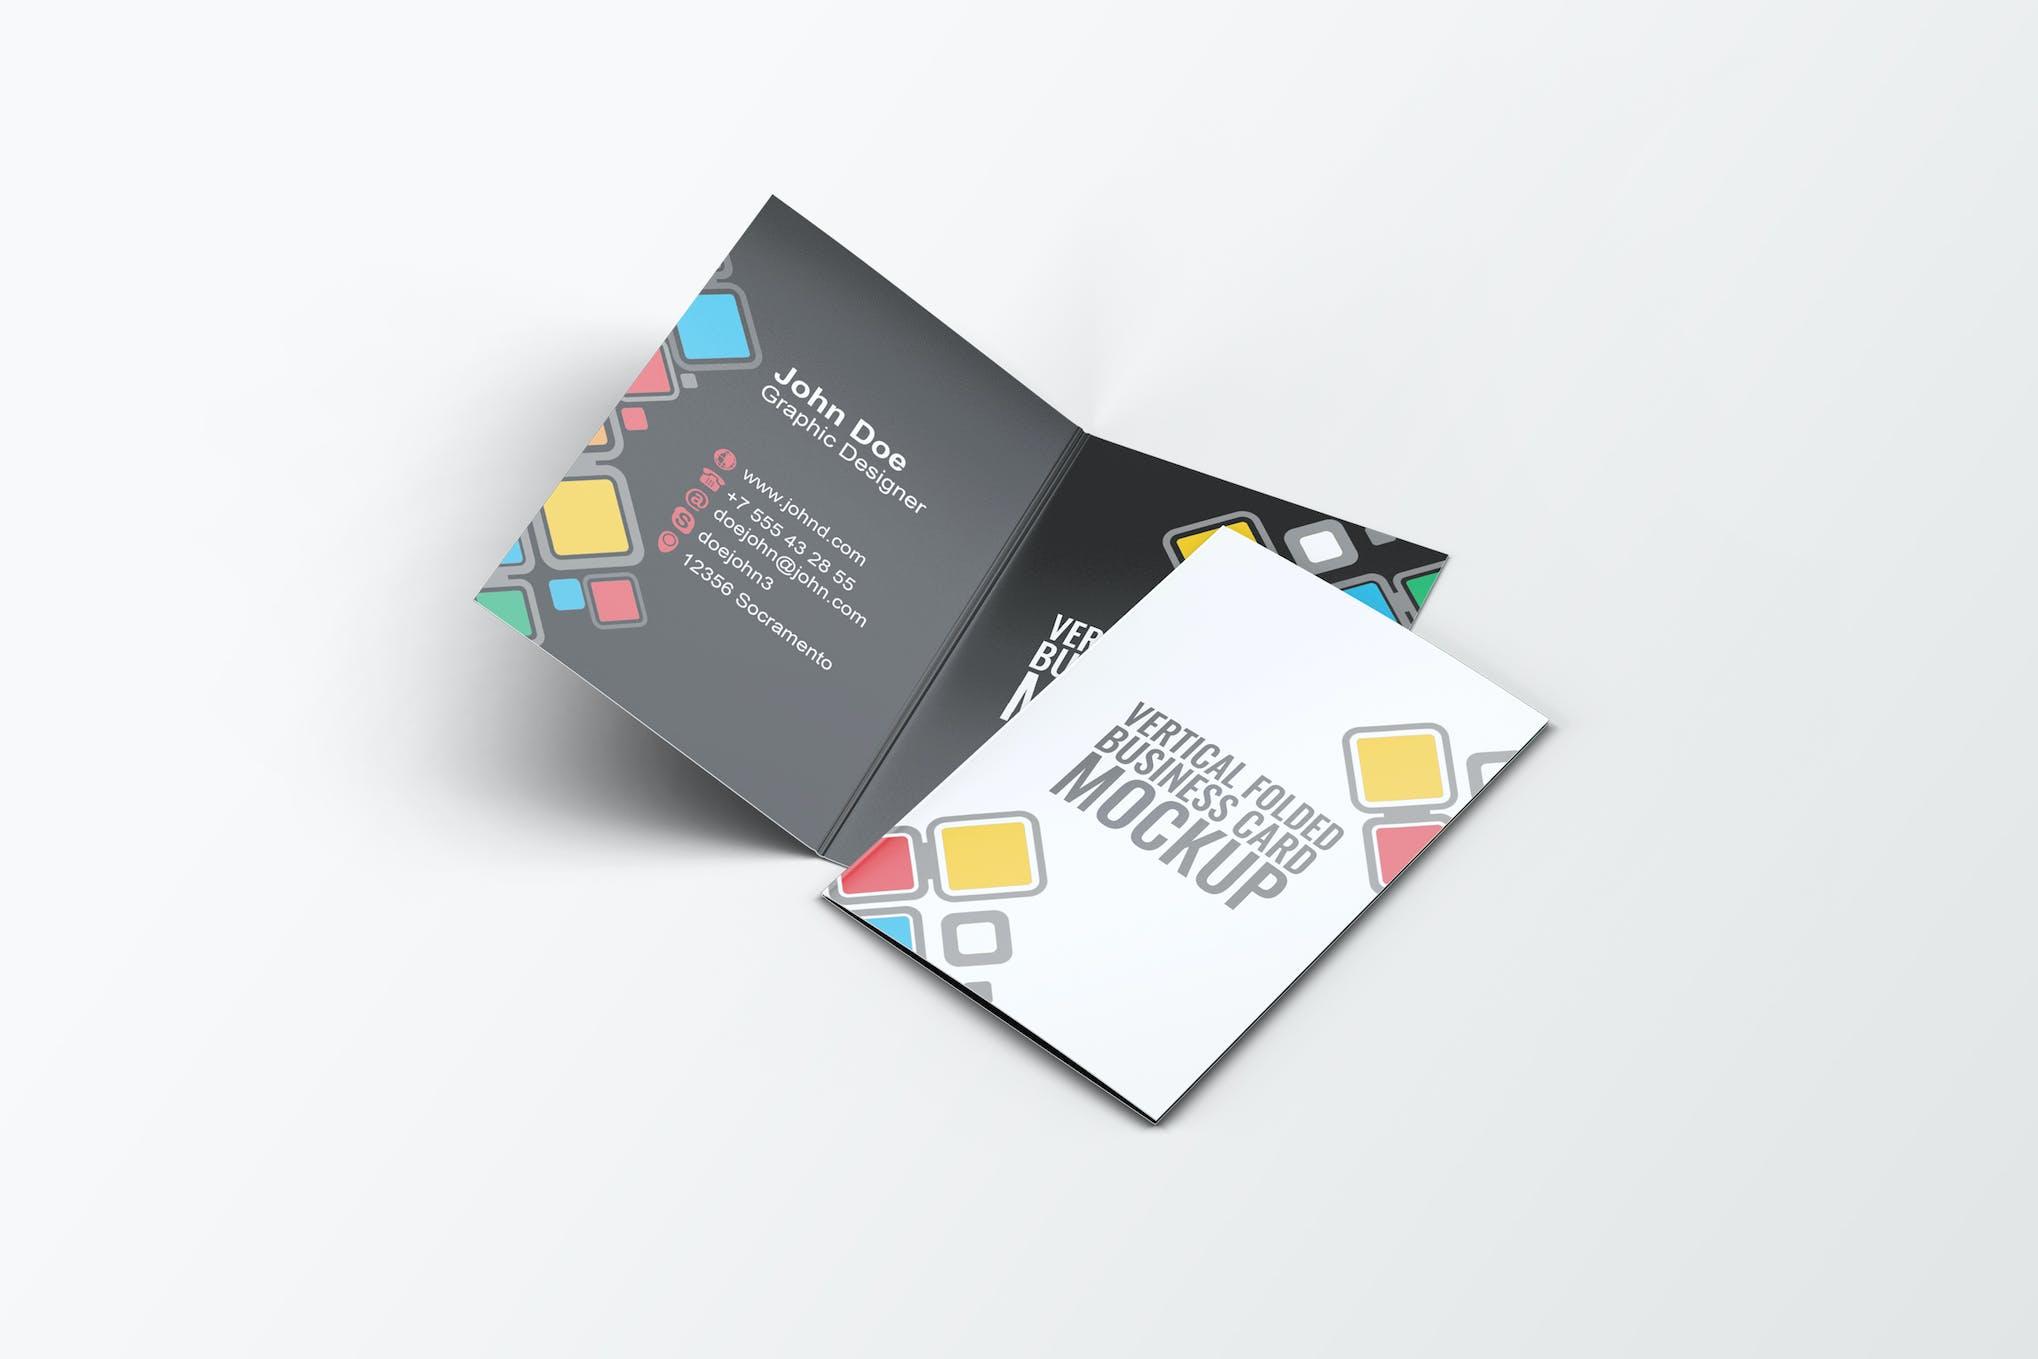 Vertical Folded Business Card Mock-Up by L5Design on Envato Elements